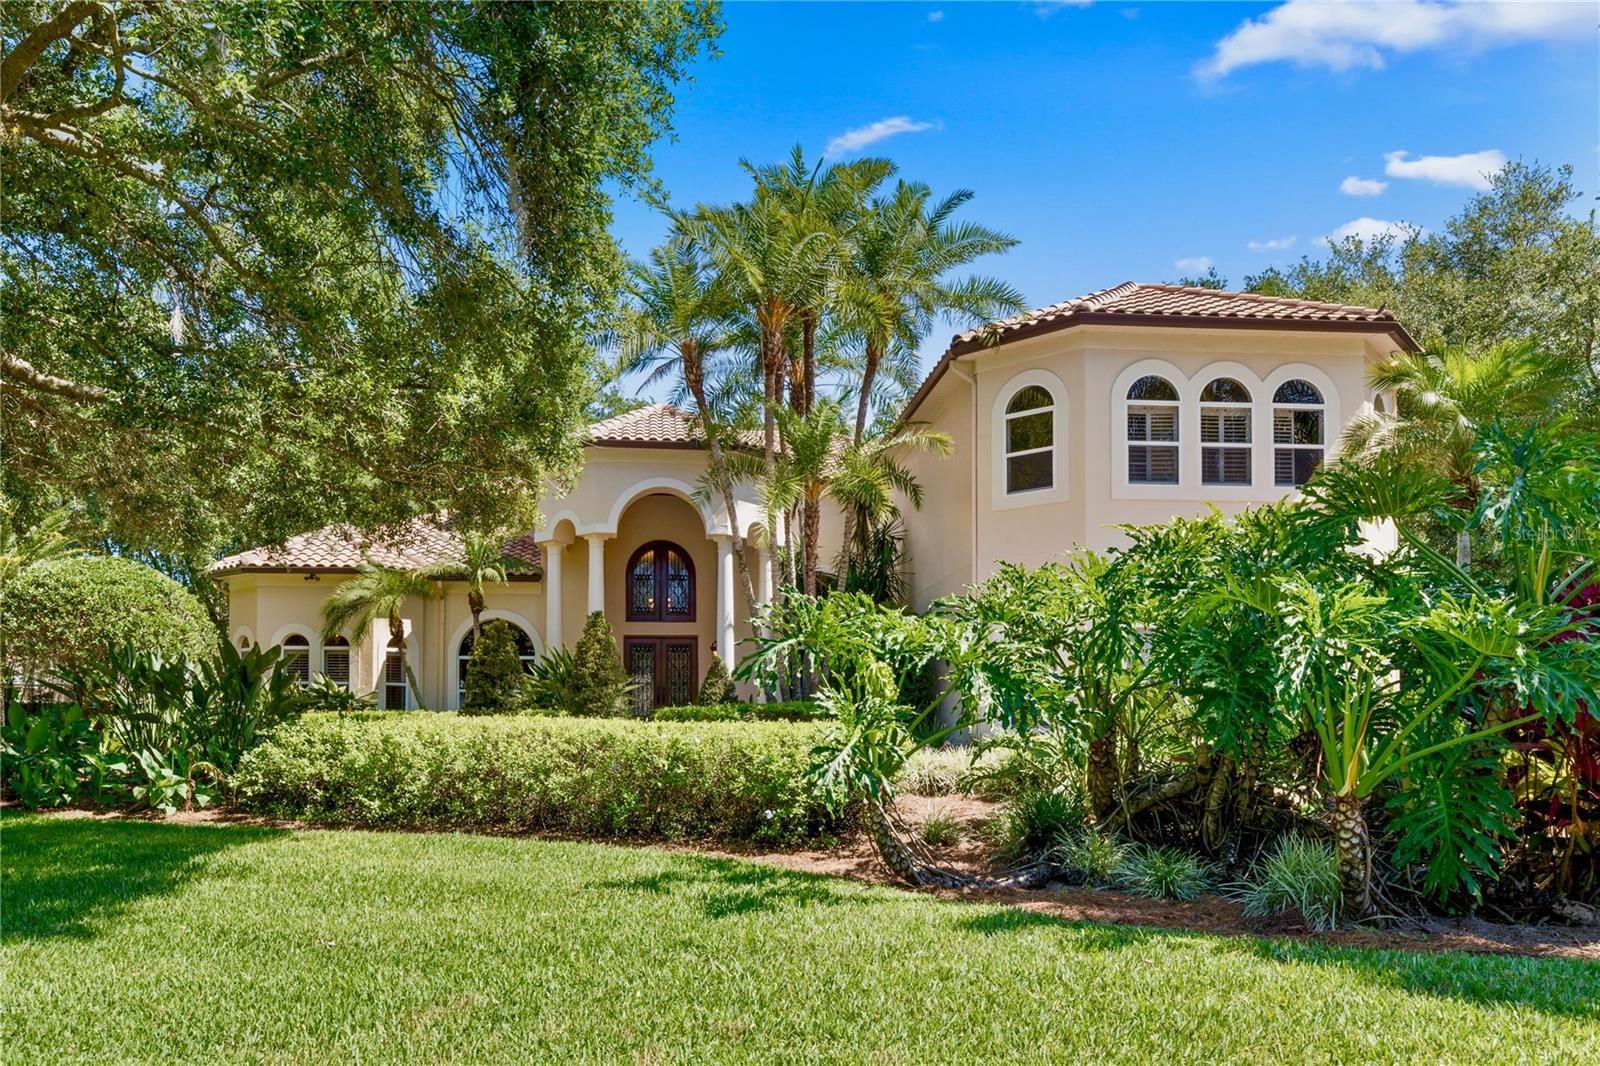 16607 VILLALENDA DE AVILA, Tampa, FL 33613 - #: T3303381